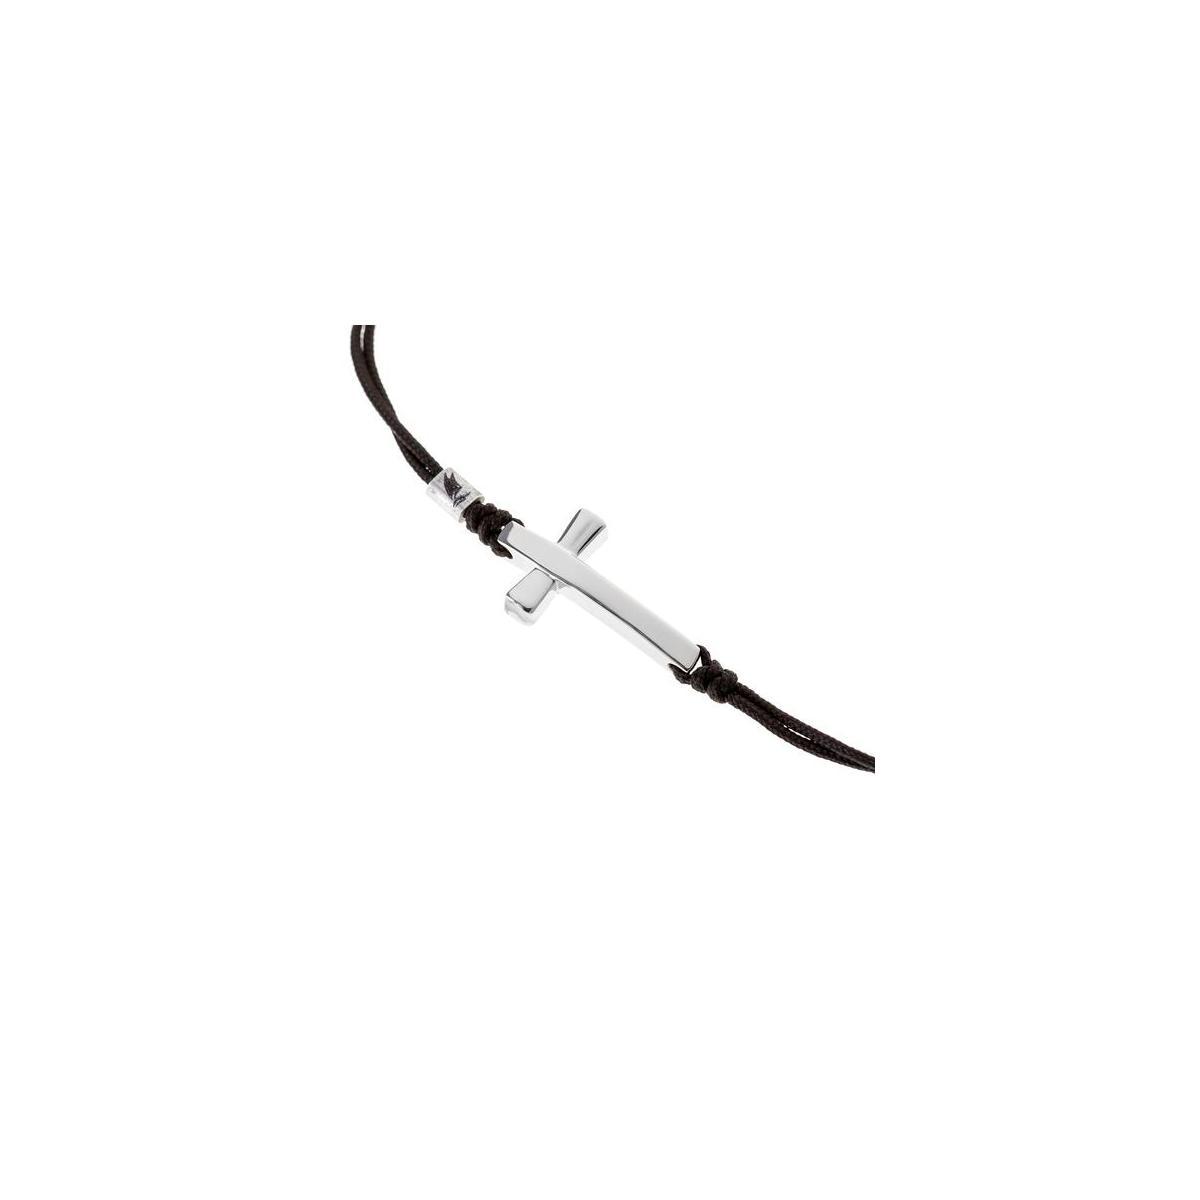 Wind Passion Inspirational String Bracelet with Cross Charm, Adjustable Unisex Pendant Rope Thread Black Bracelets for Women Men